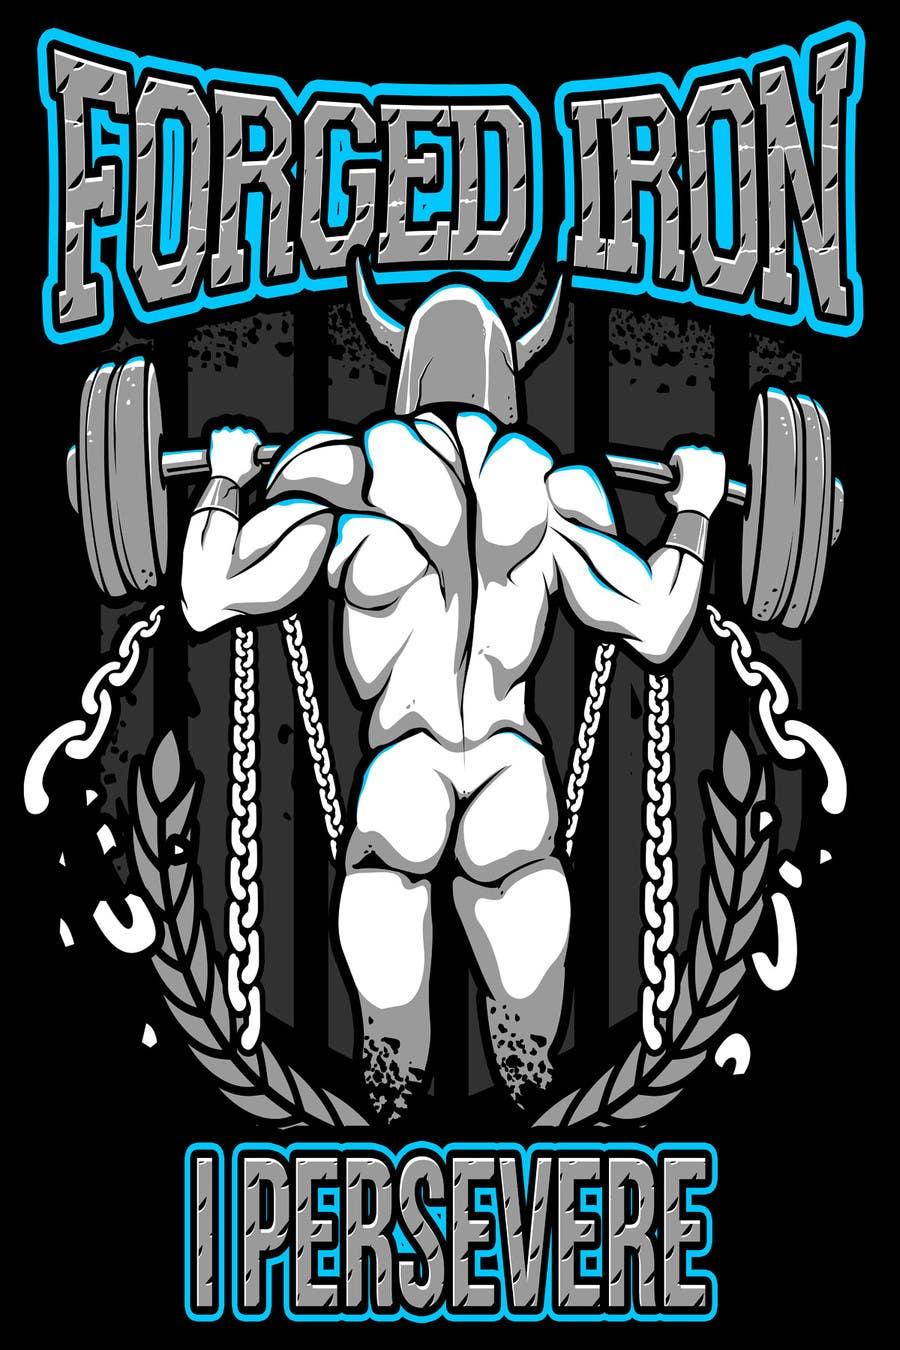 #31 para Need  a t-shirt design -- For Fitness, Weightlifting, Hardcore Training Apparel Company de bamz23